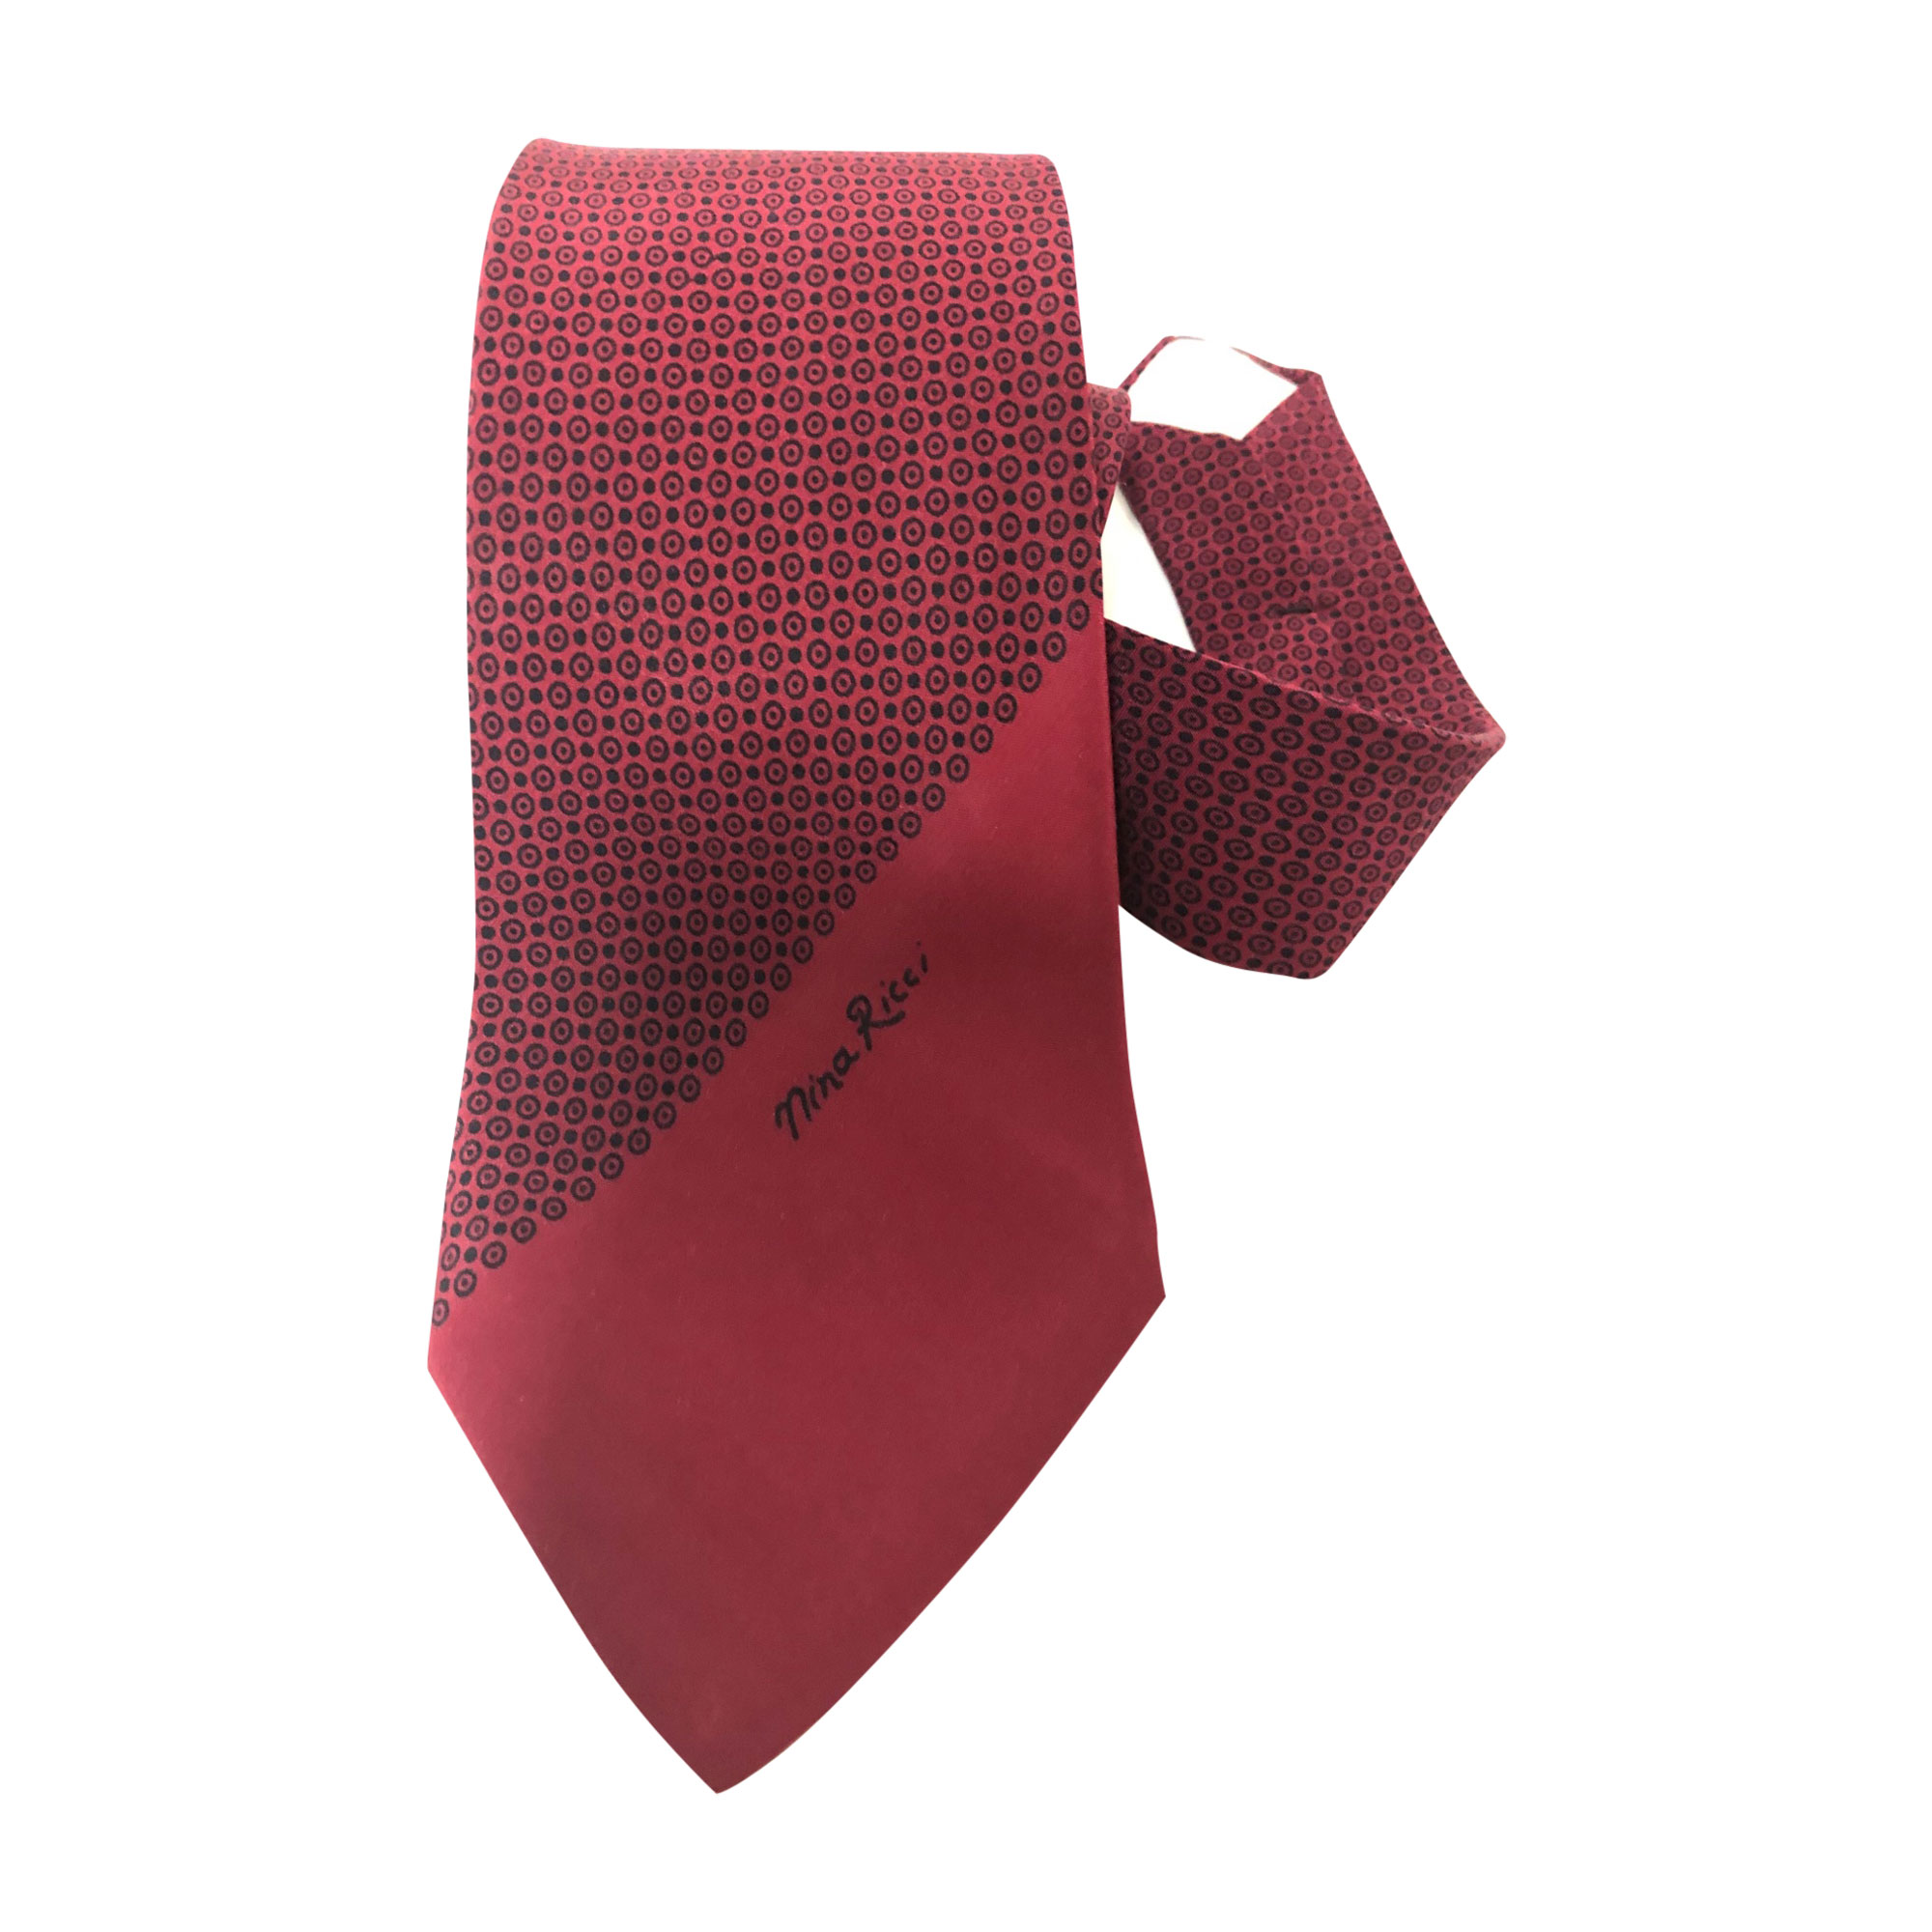 Tie NINA RICCI Red, burgundy